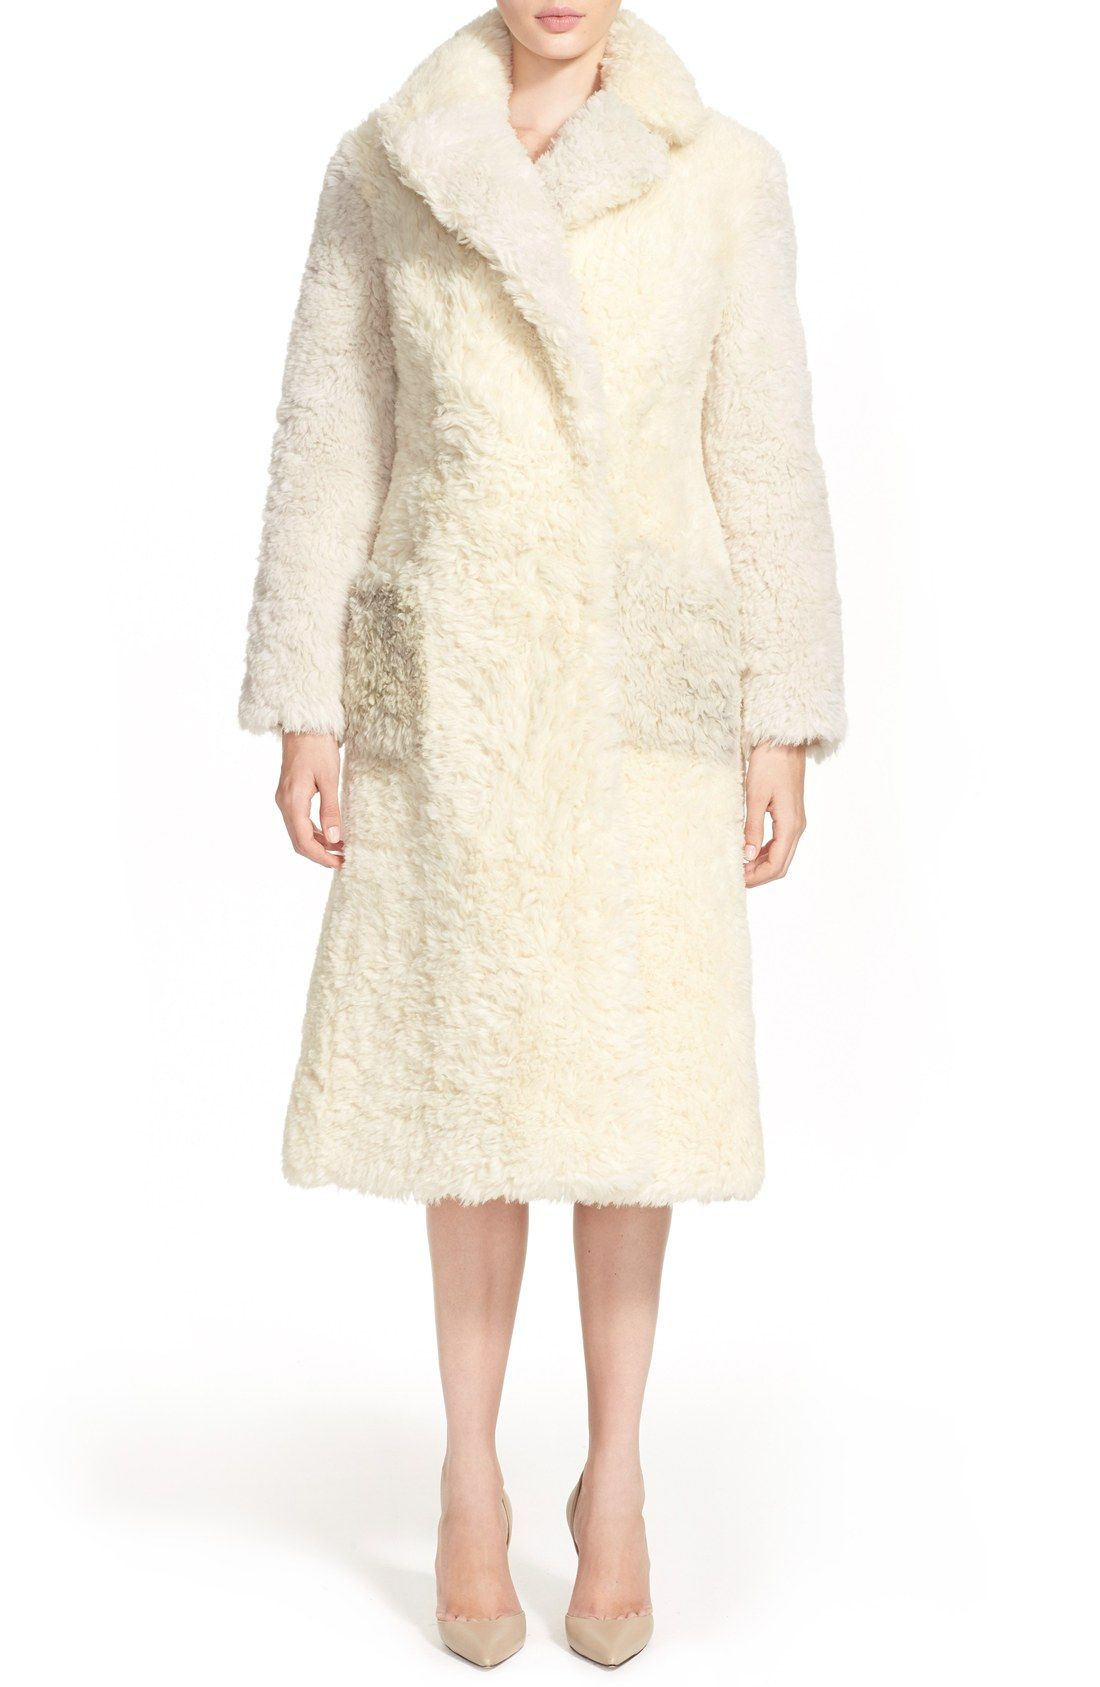 Vika Gazinskya Colorblock Alpaca & Mohair Coat